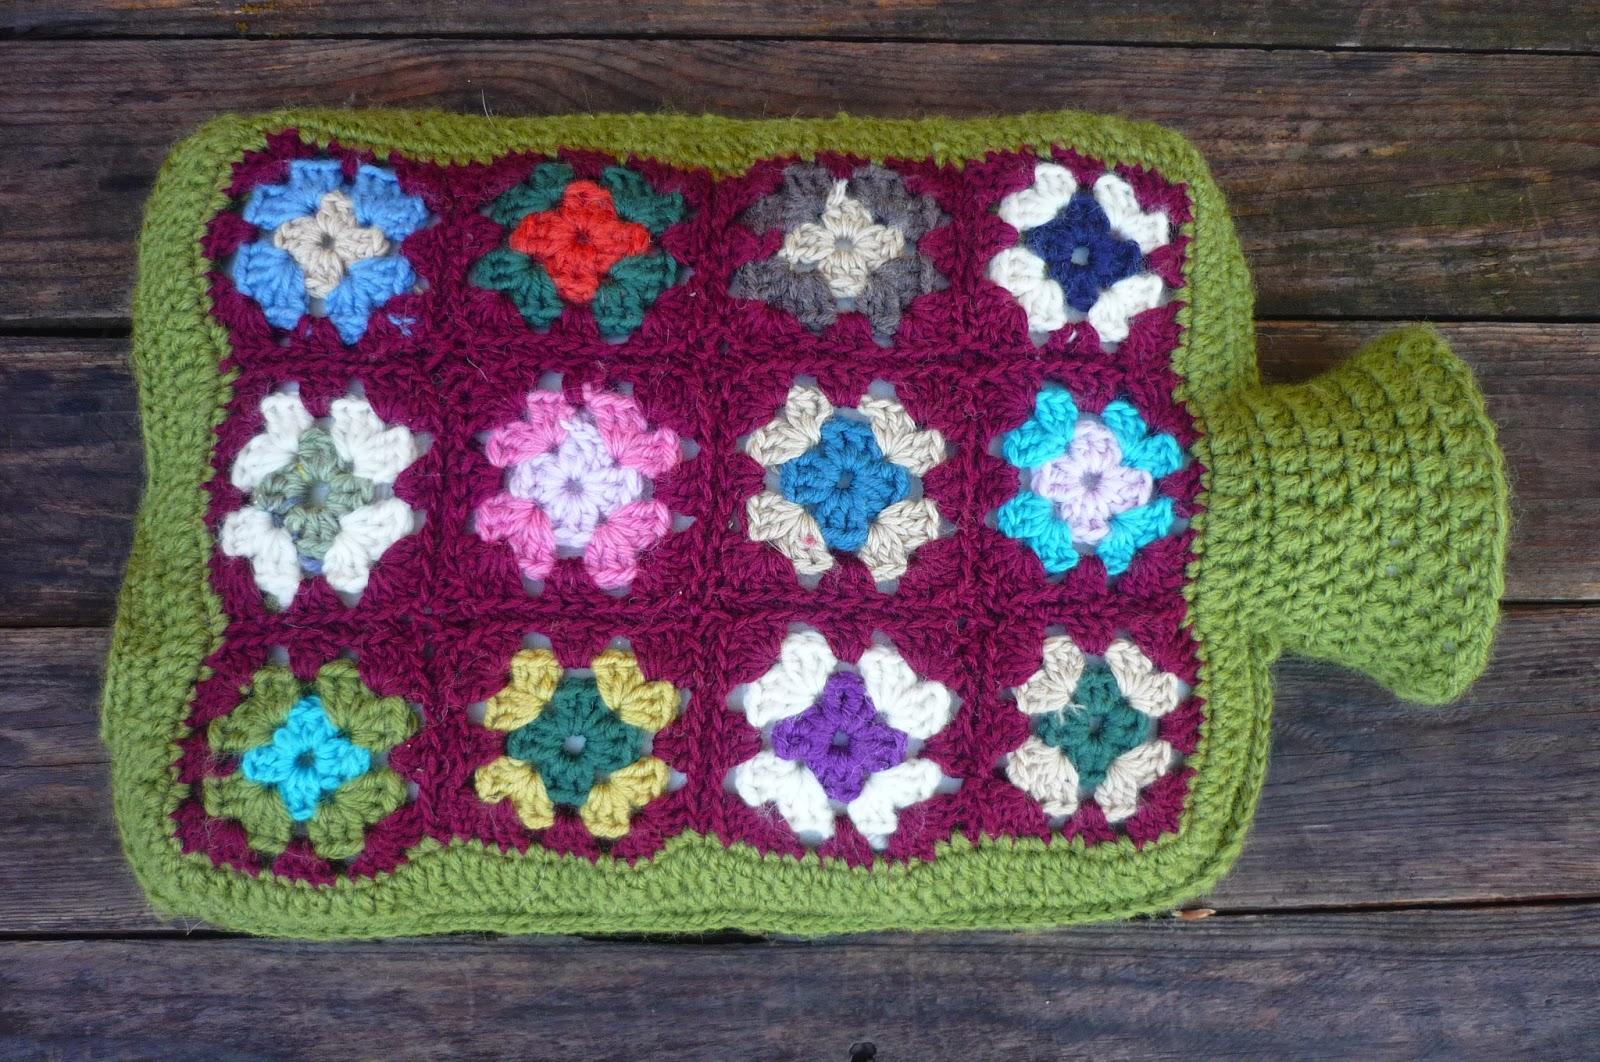 Asombroso Bolsa De Agua Caliente Patrón De Crochet Cubierta Foto ...